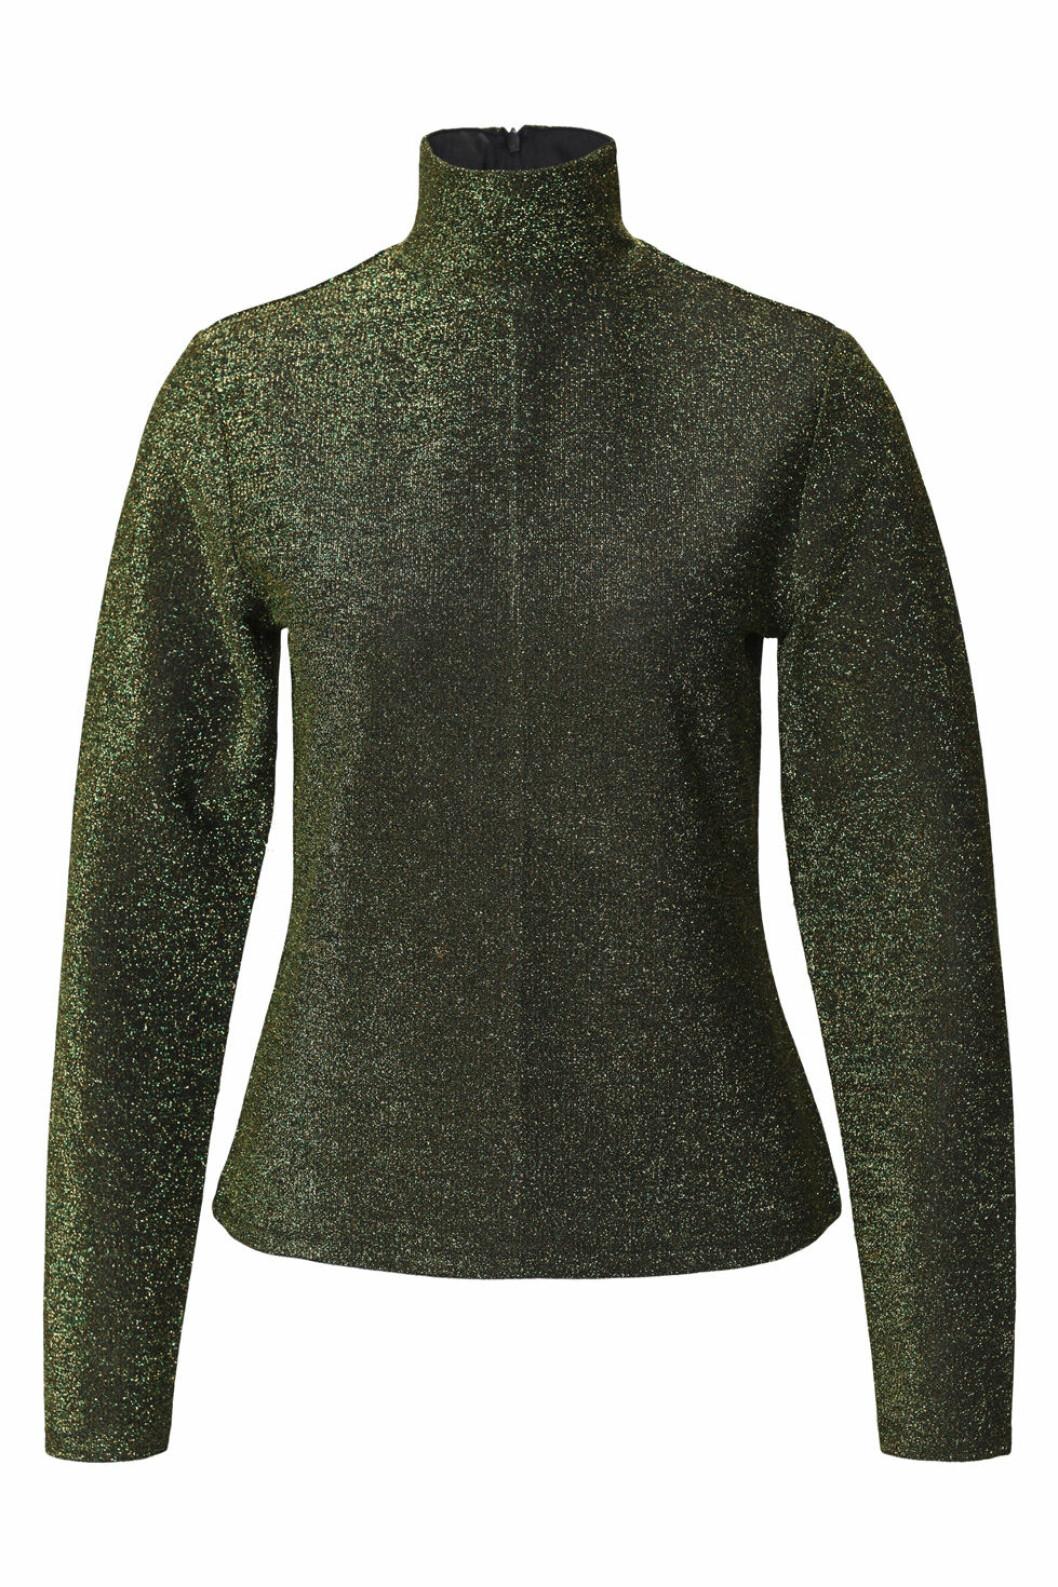 Maria Westerlind x MQ grön glitterpolo